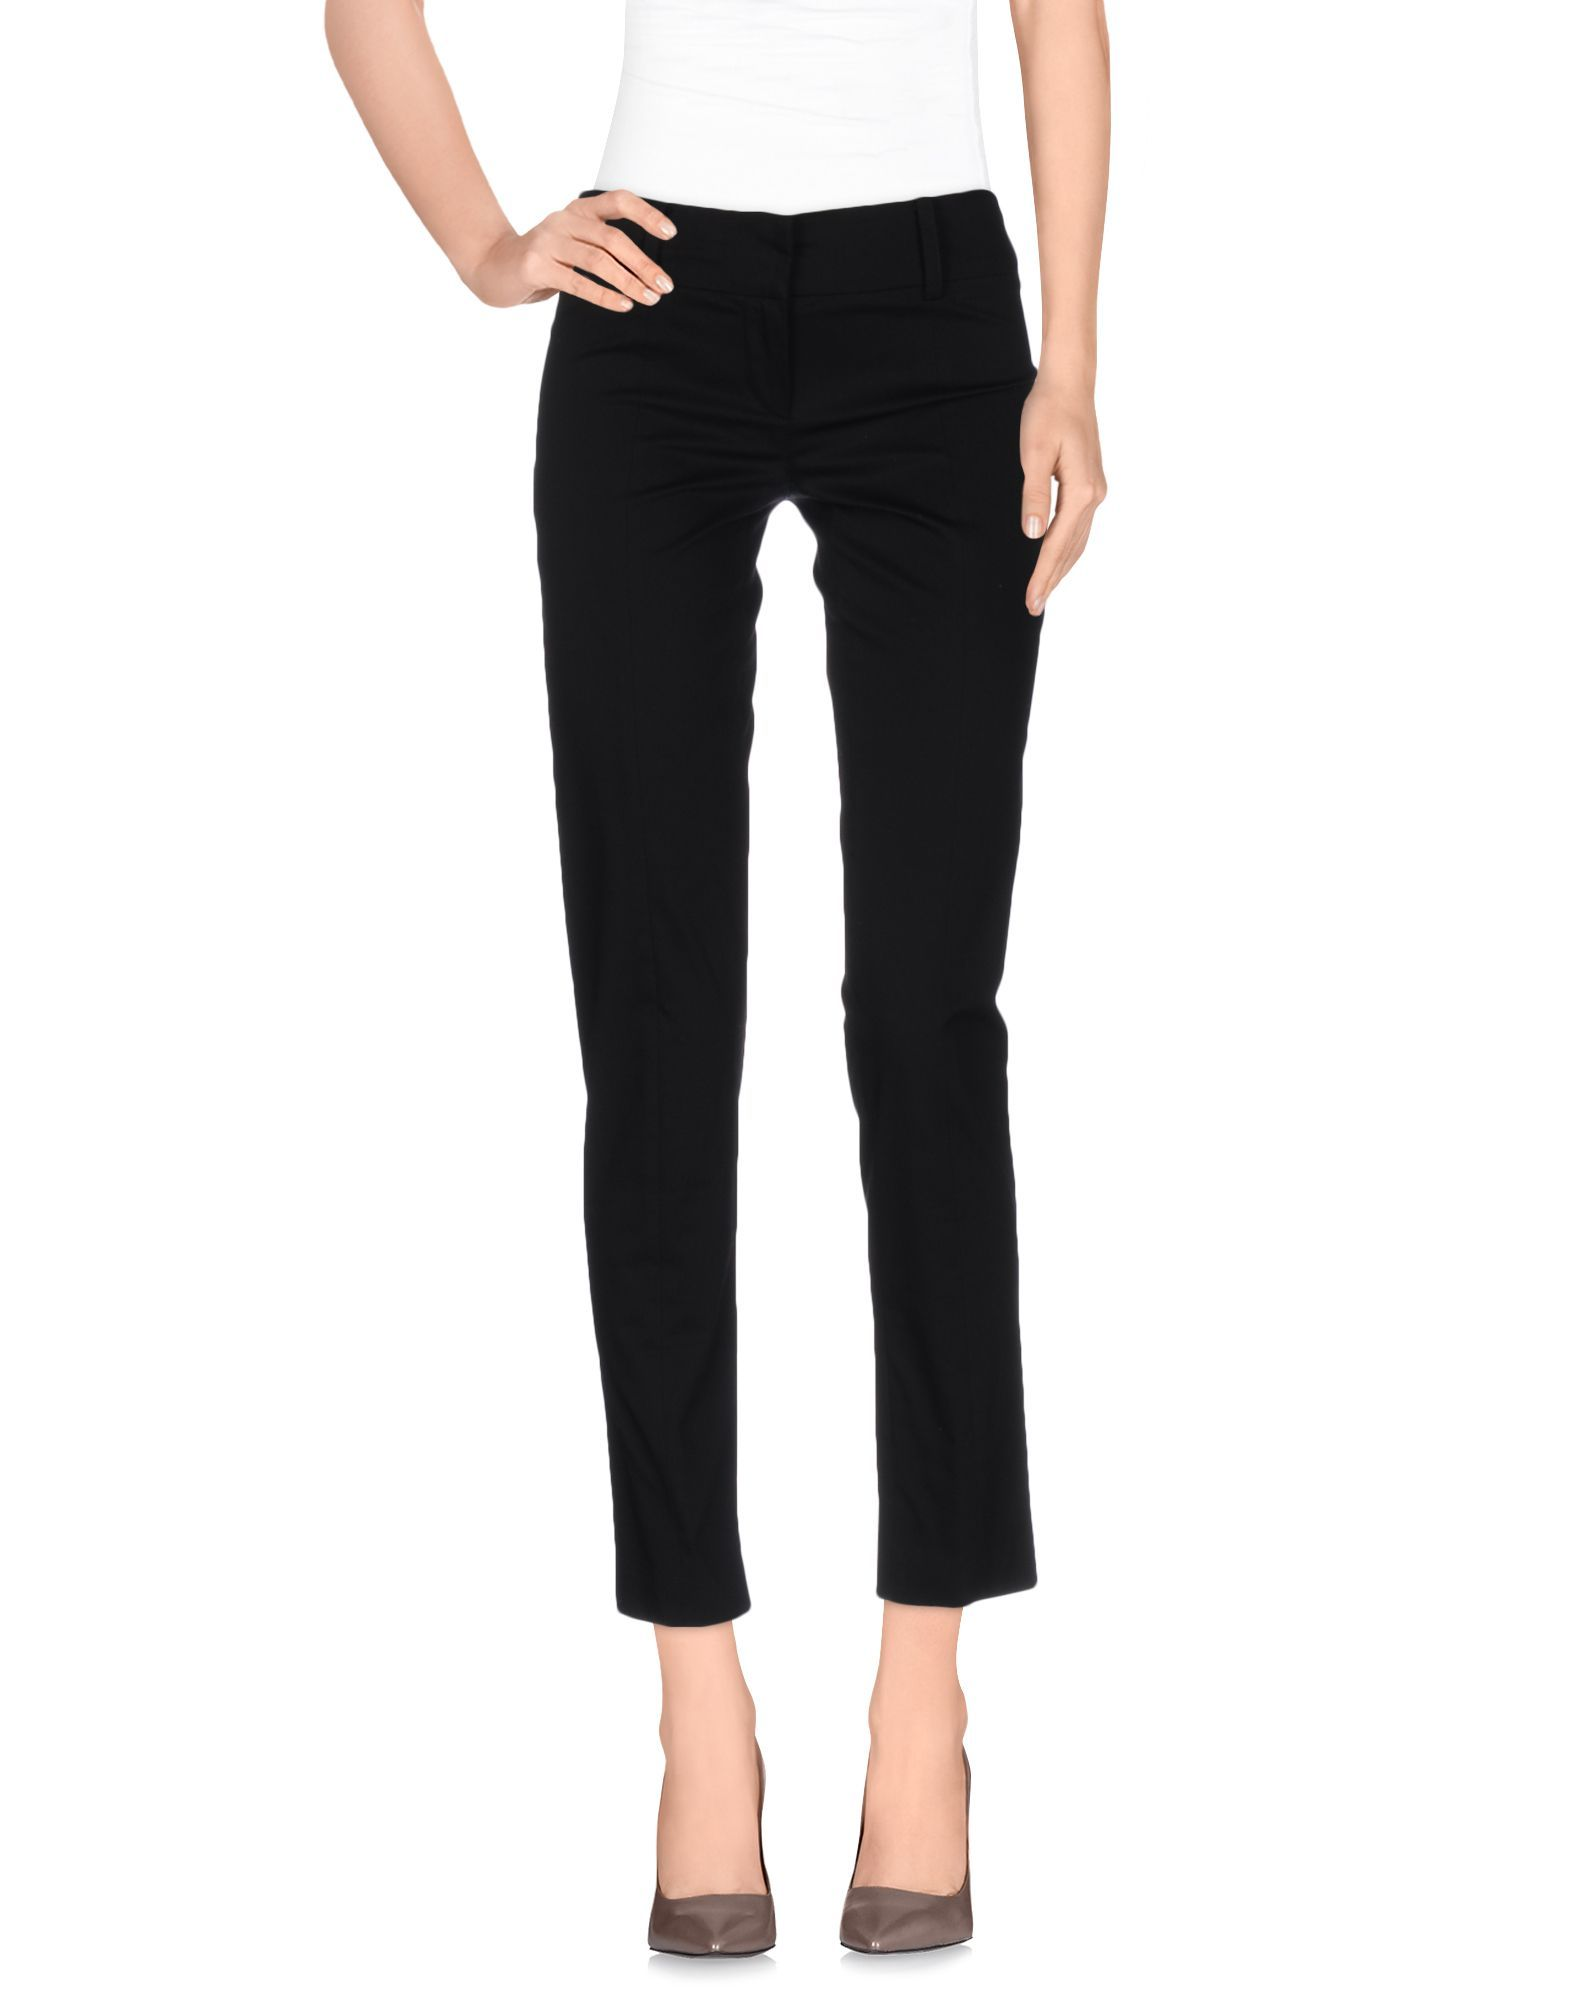 Patrizia Pepe Black Cotton Trousers